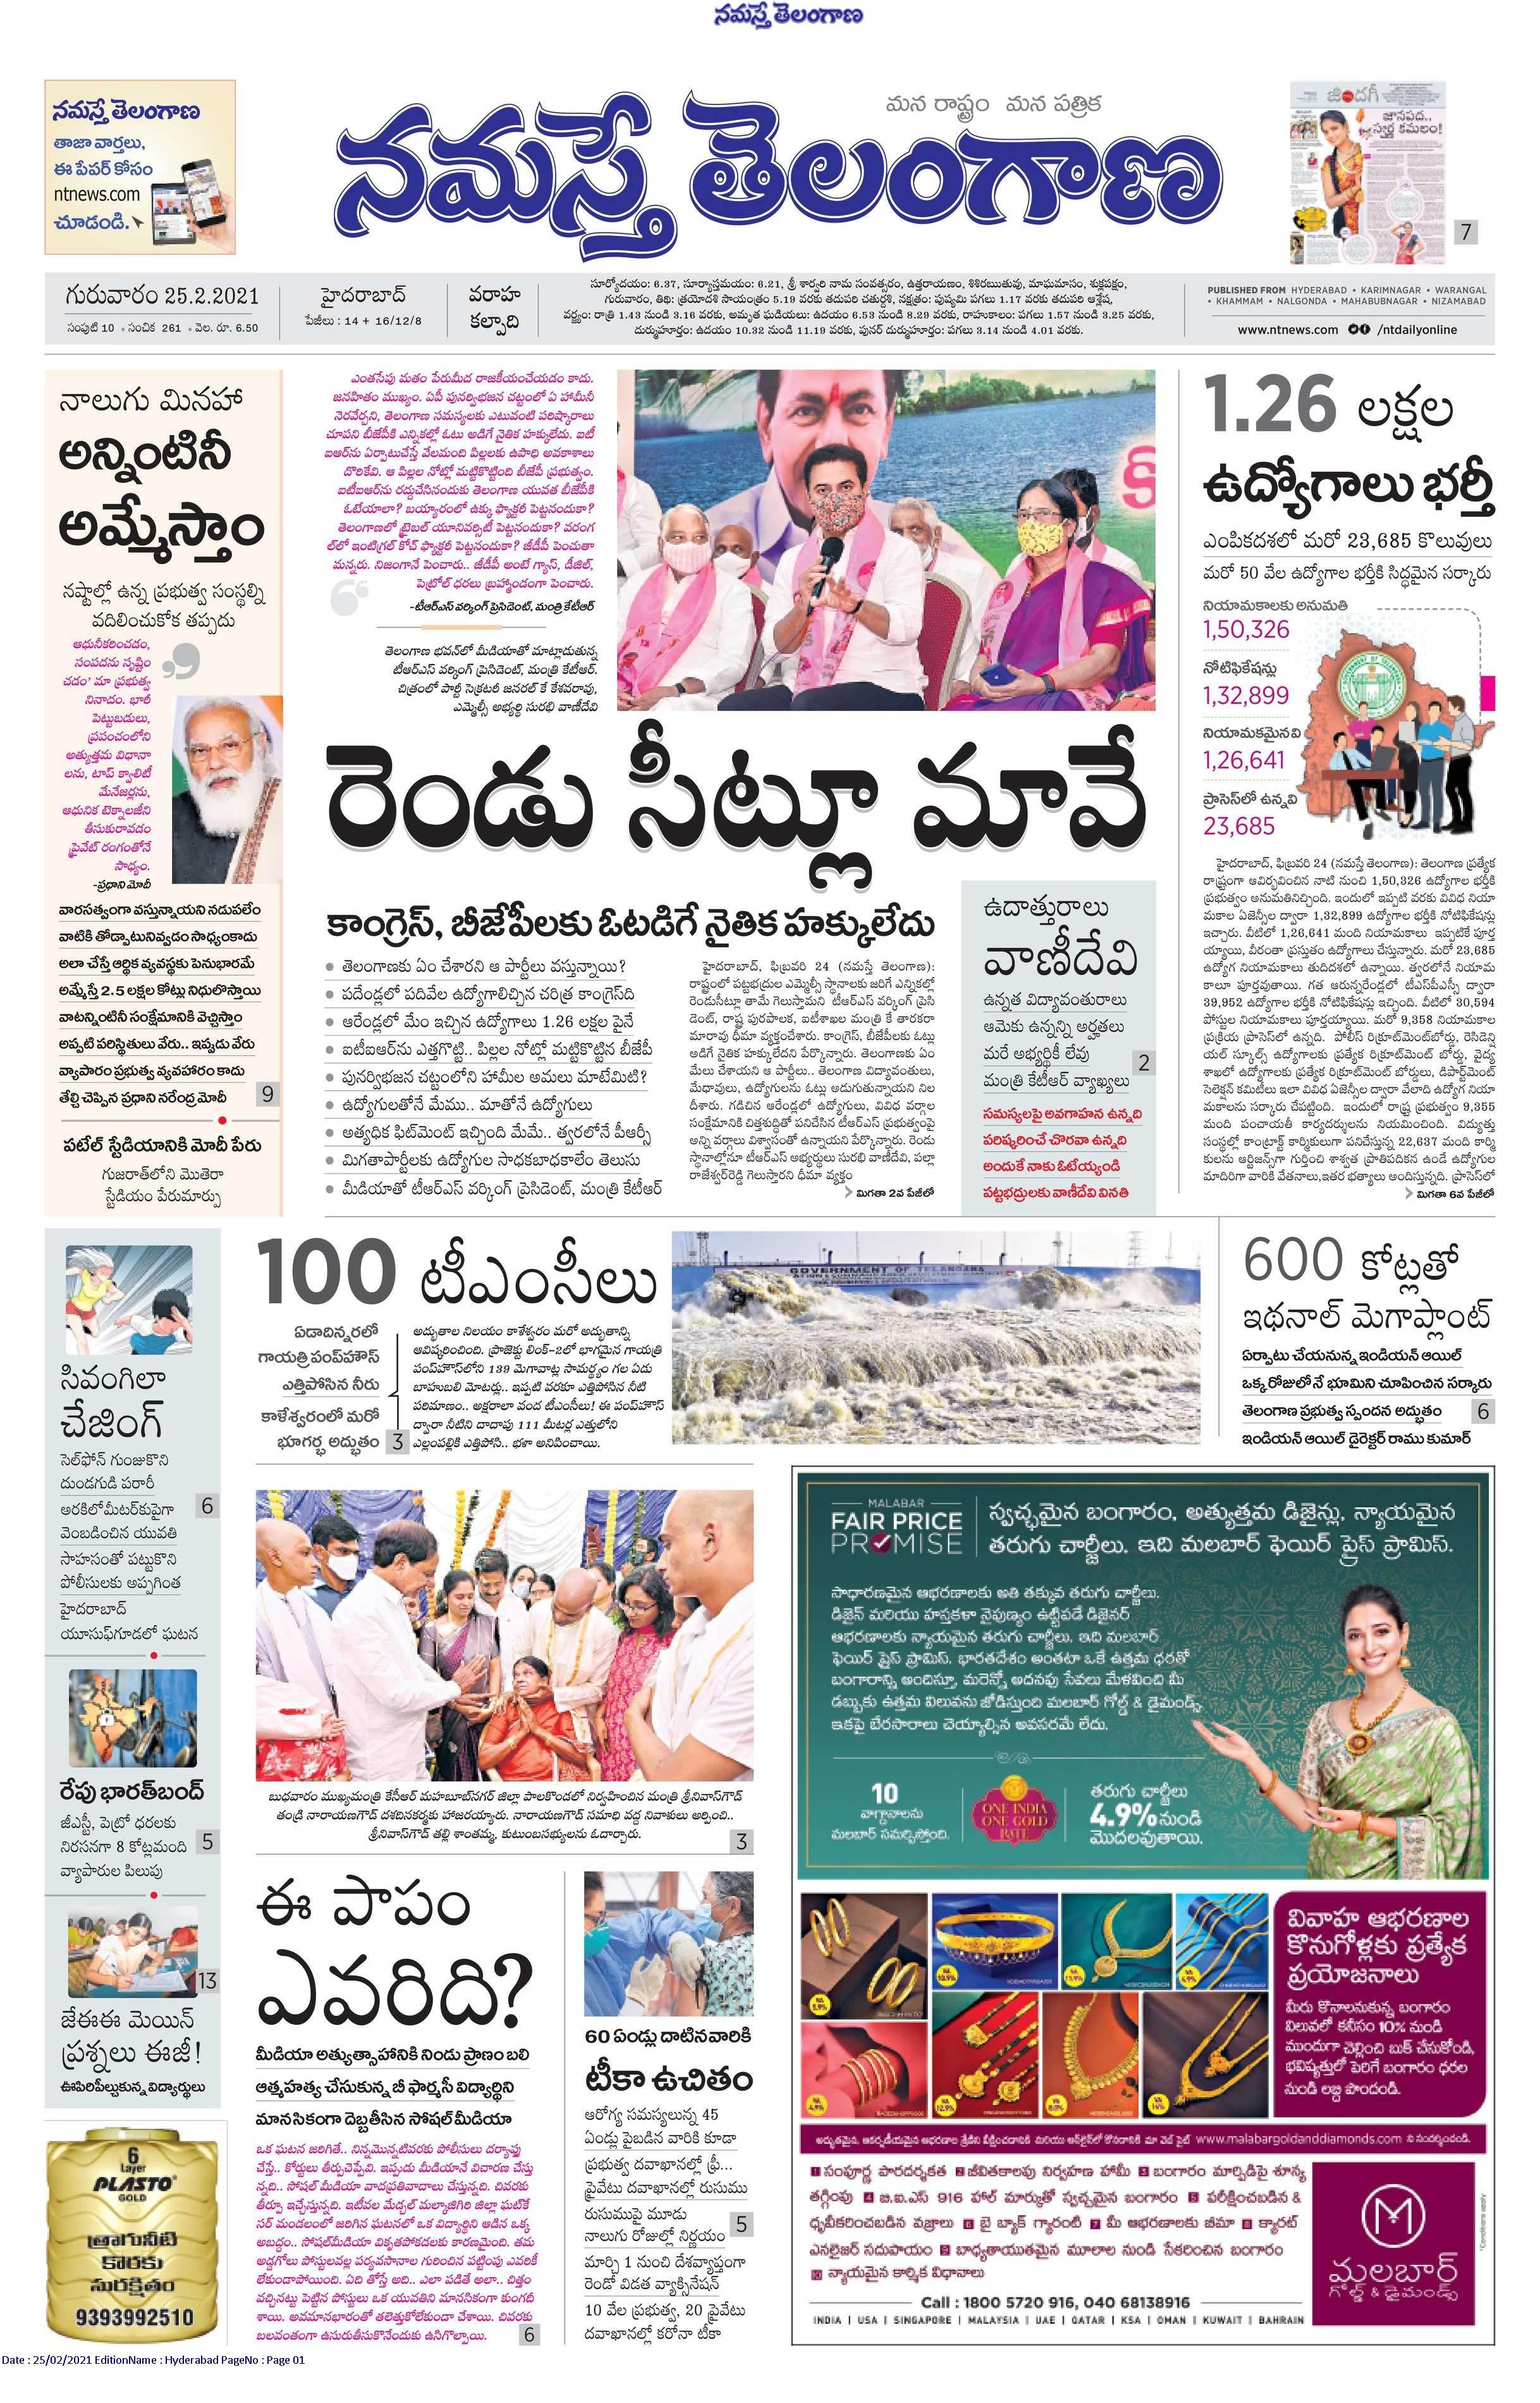 Namasthe Telangana Newspaper Advertising